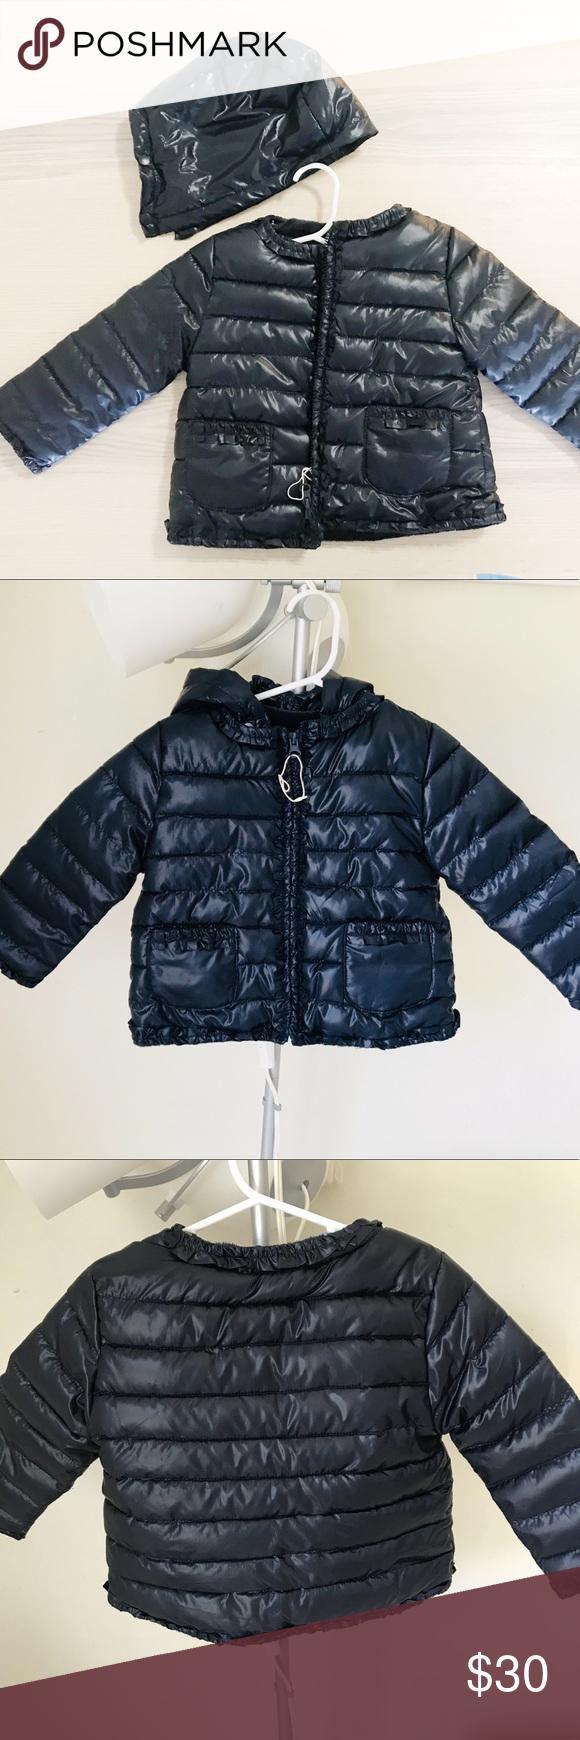 eaf0c82a5b1c Zara baby girl 12-18 months puffer coat NWT